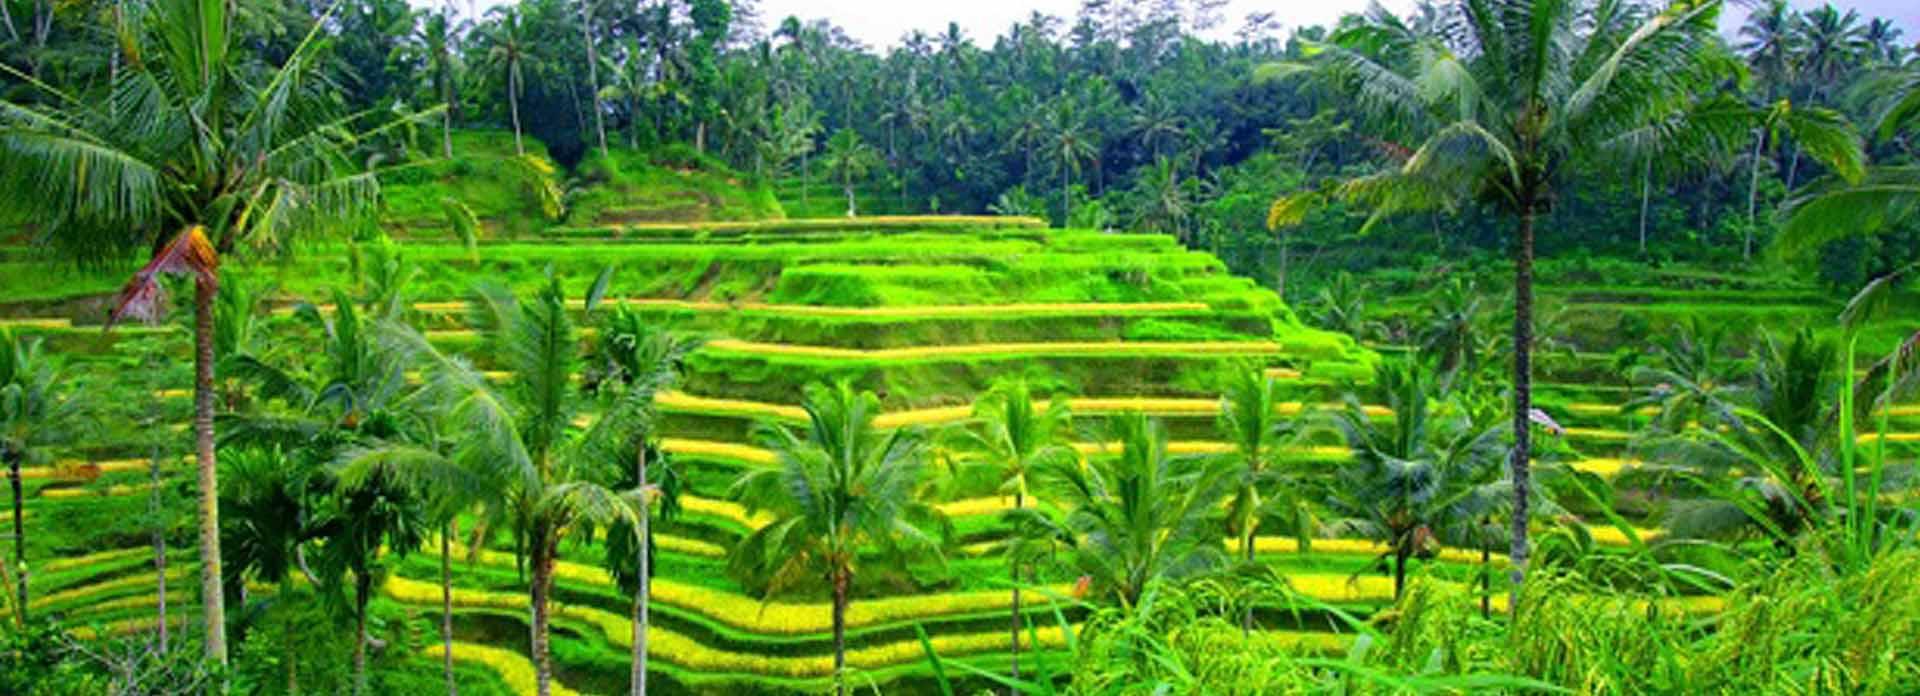 Parikrama Travels Bali Banner 5